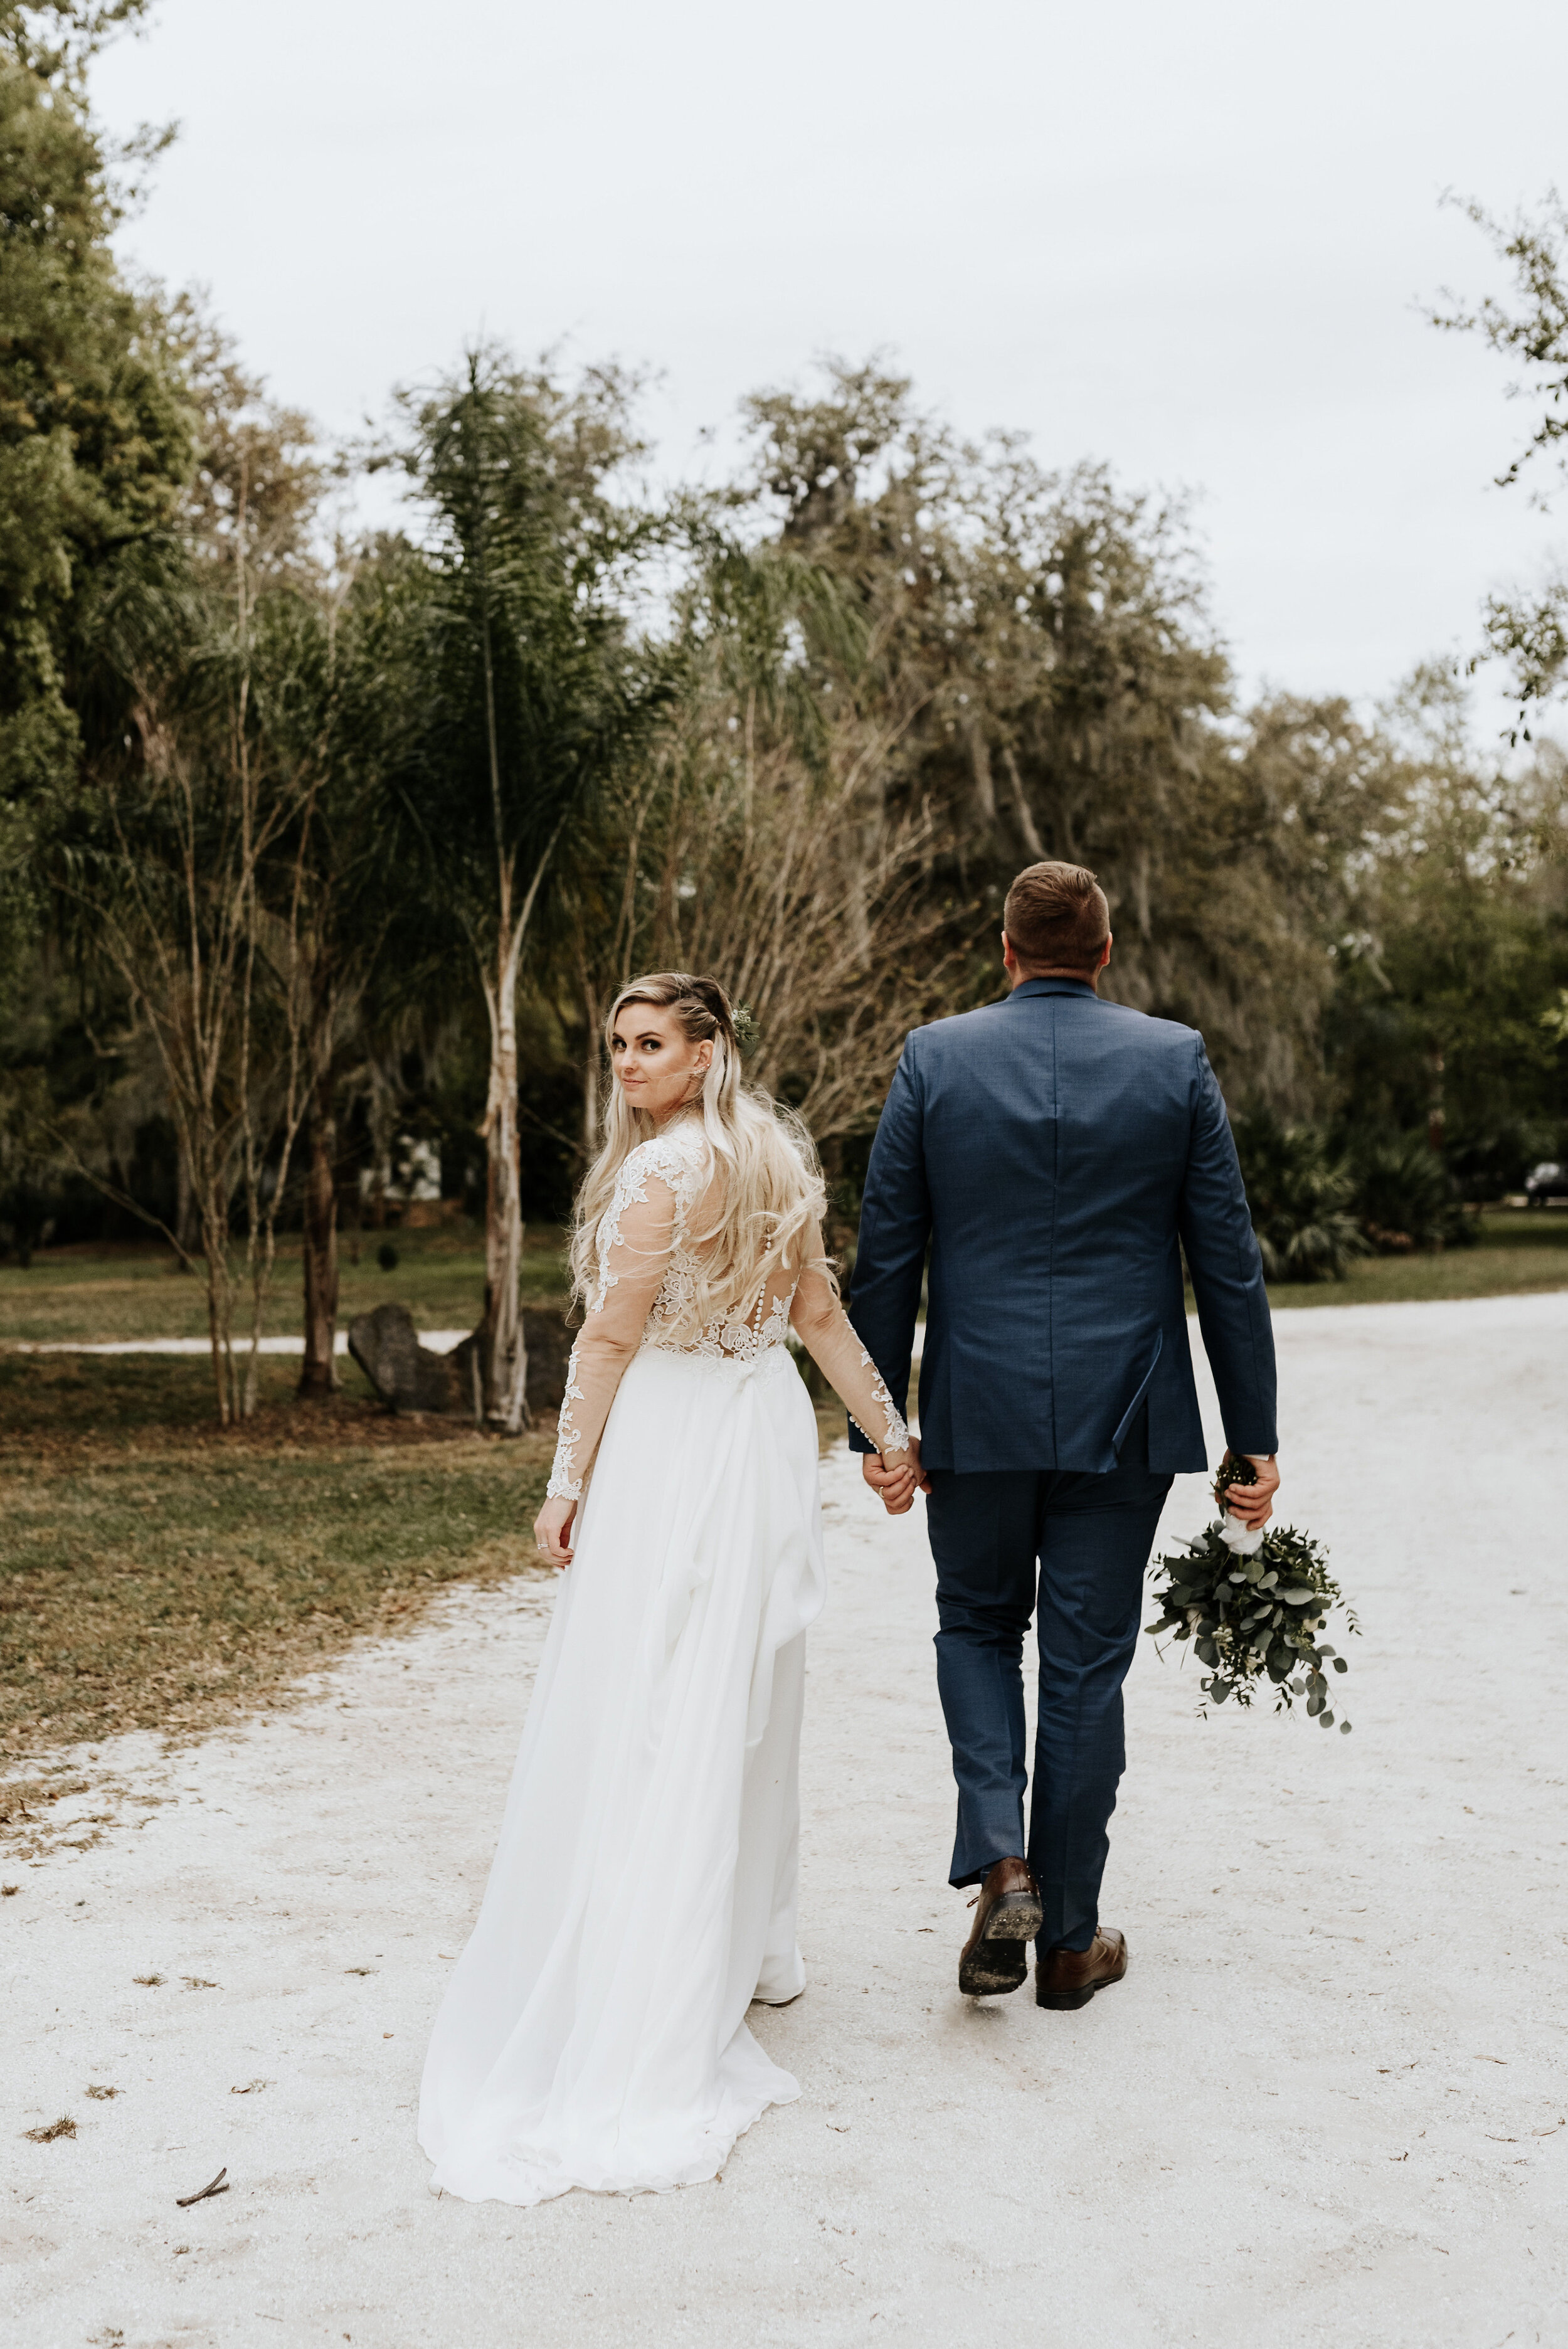 Mikenzi_Brad_Wedding_The_Delamater_House_New_Smyrna_Beach_Florida_Photography_by_V_0881.jpg